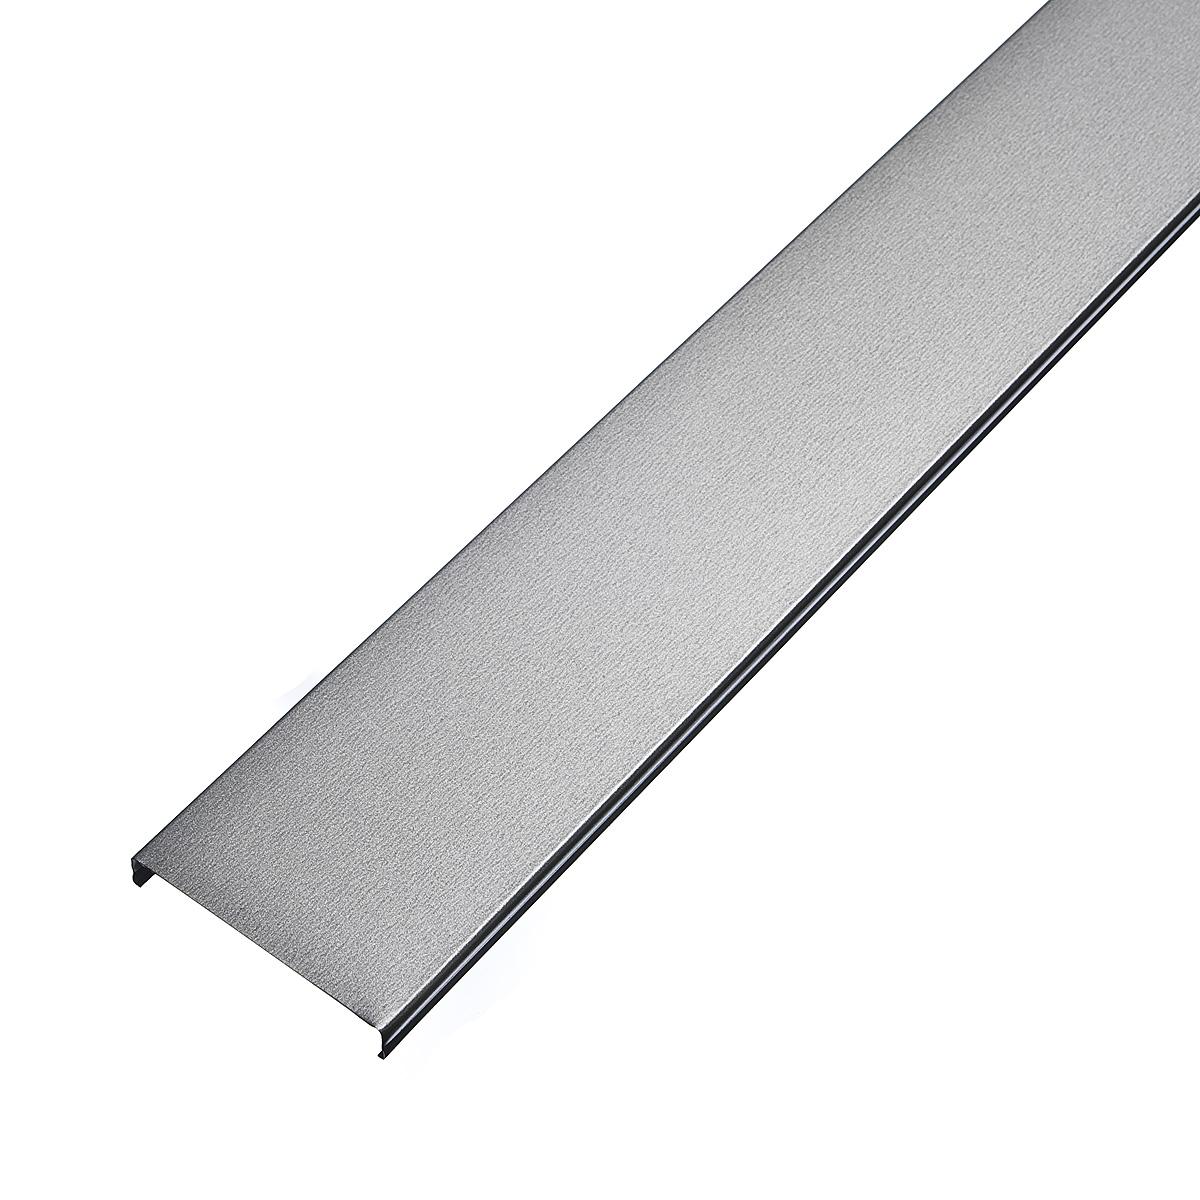 Рейка открытого типа AN 85А 3м серебристый металлик